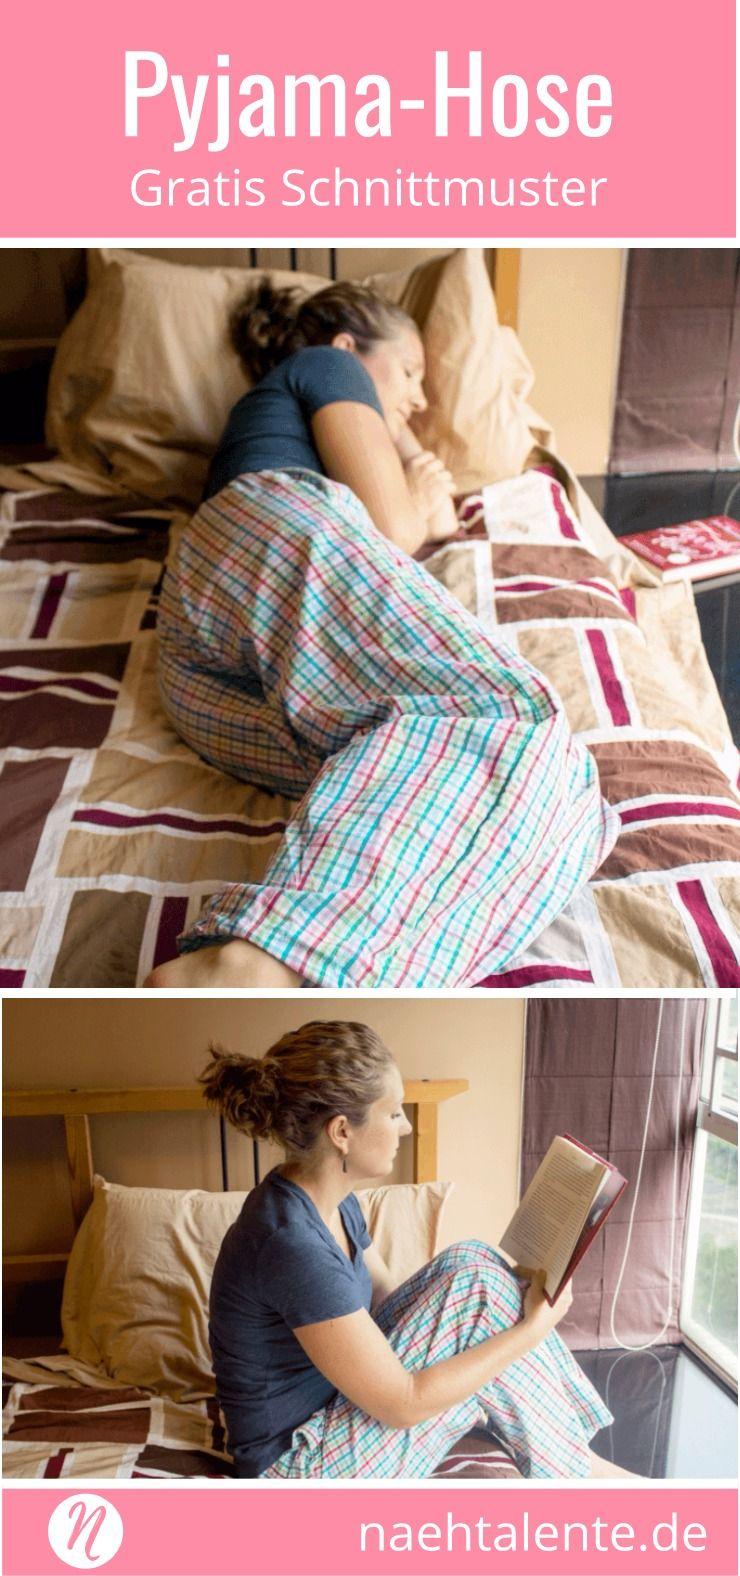 Pyjama-Hose - Lounge-Pant | Pinterest | Gratis schnittmuster, Für ...